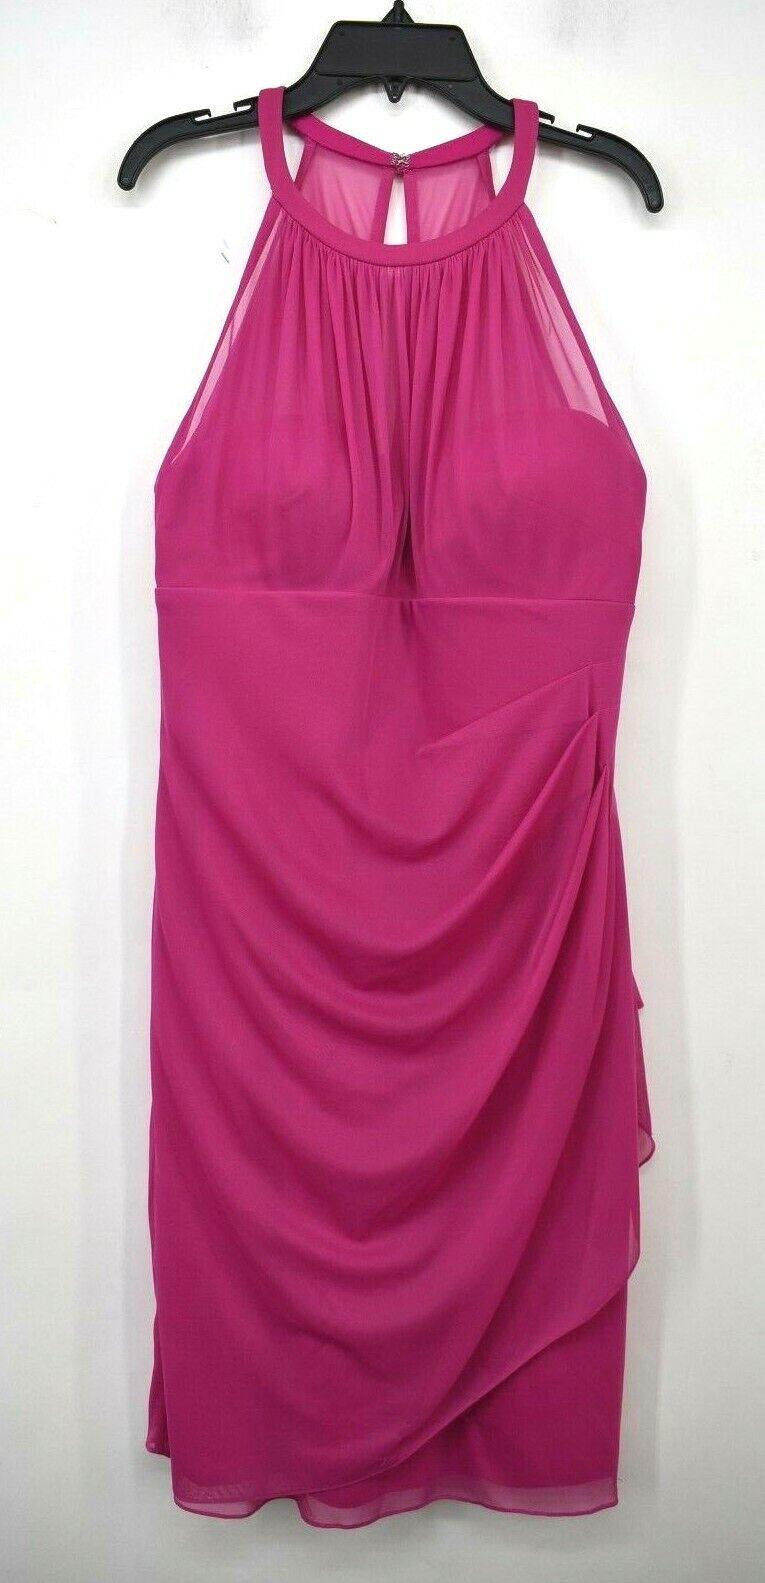 David's Bridal Womens Side Cascade Short Plum High Neck Bridesmaid Dress 10